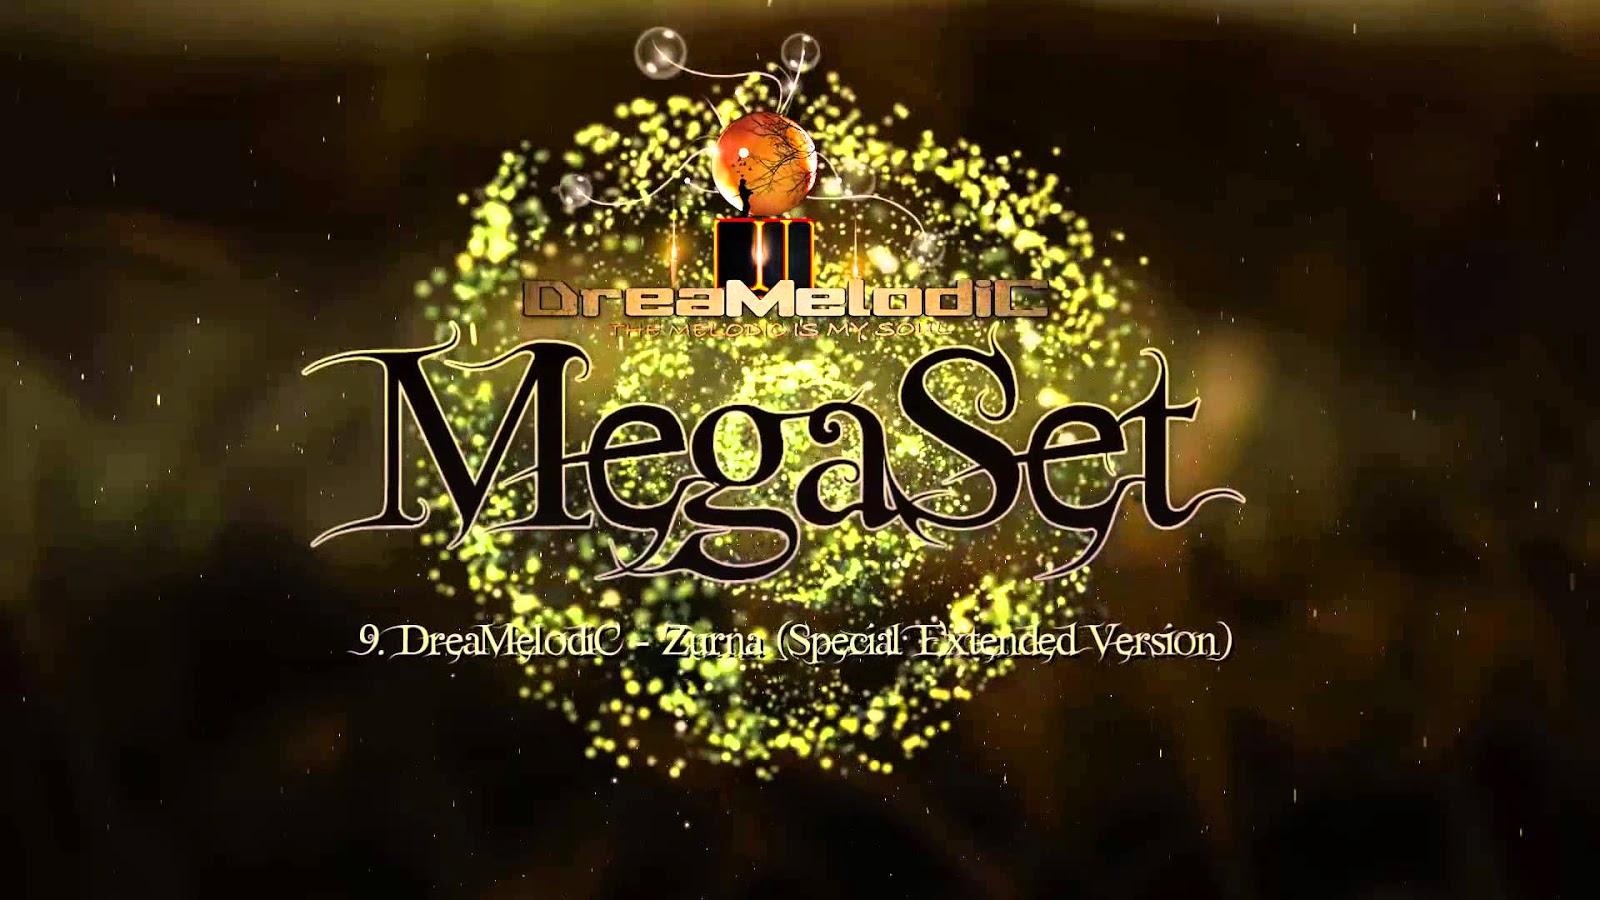 DreaMelodiC - MegaSet 2015